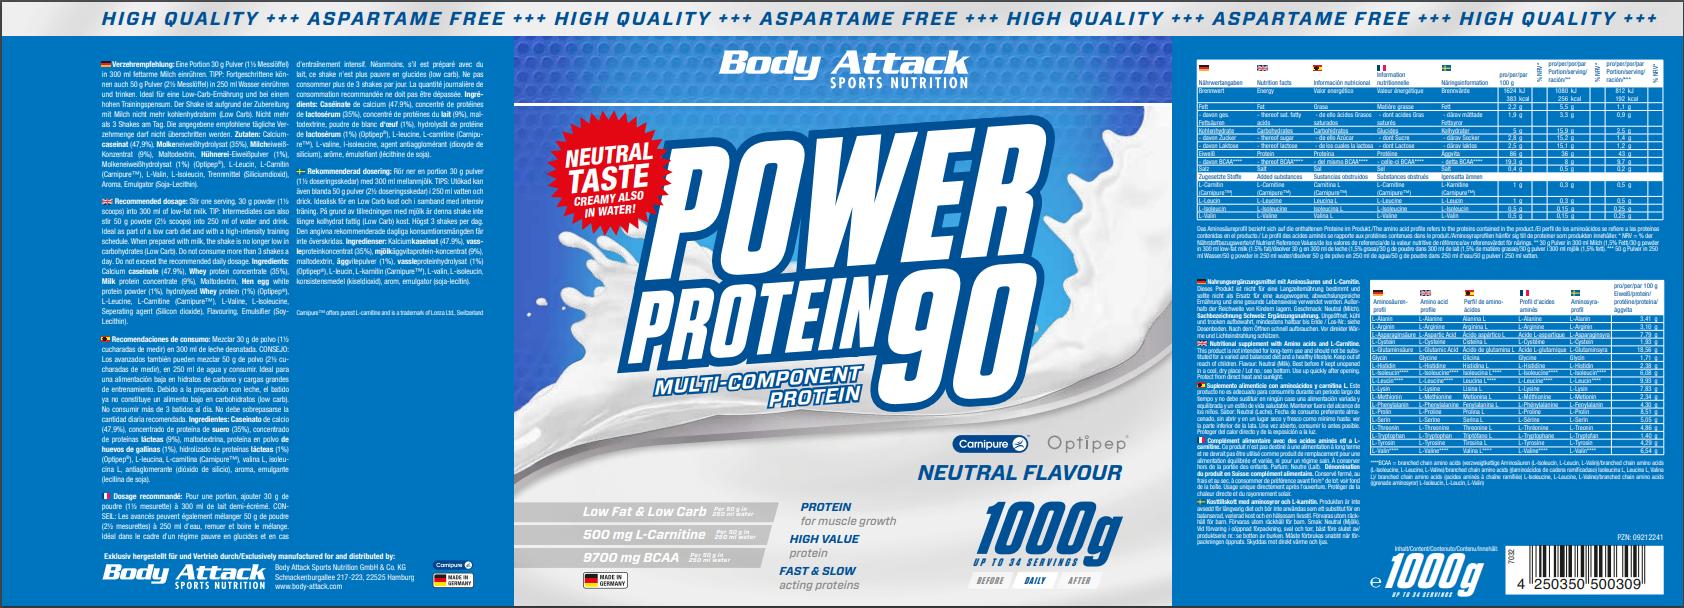 Power Proti 90 Natural